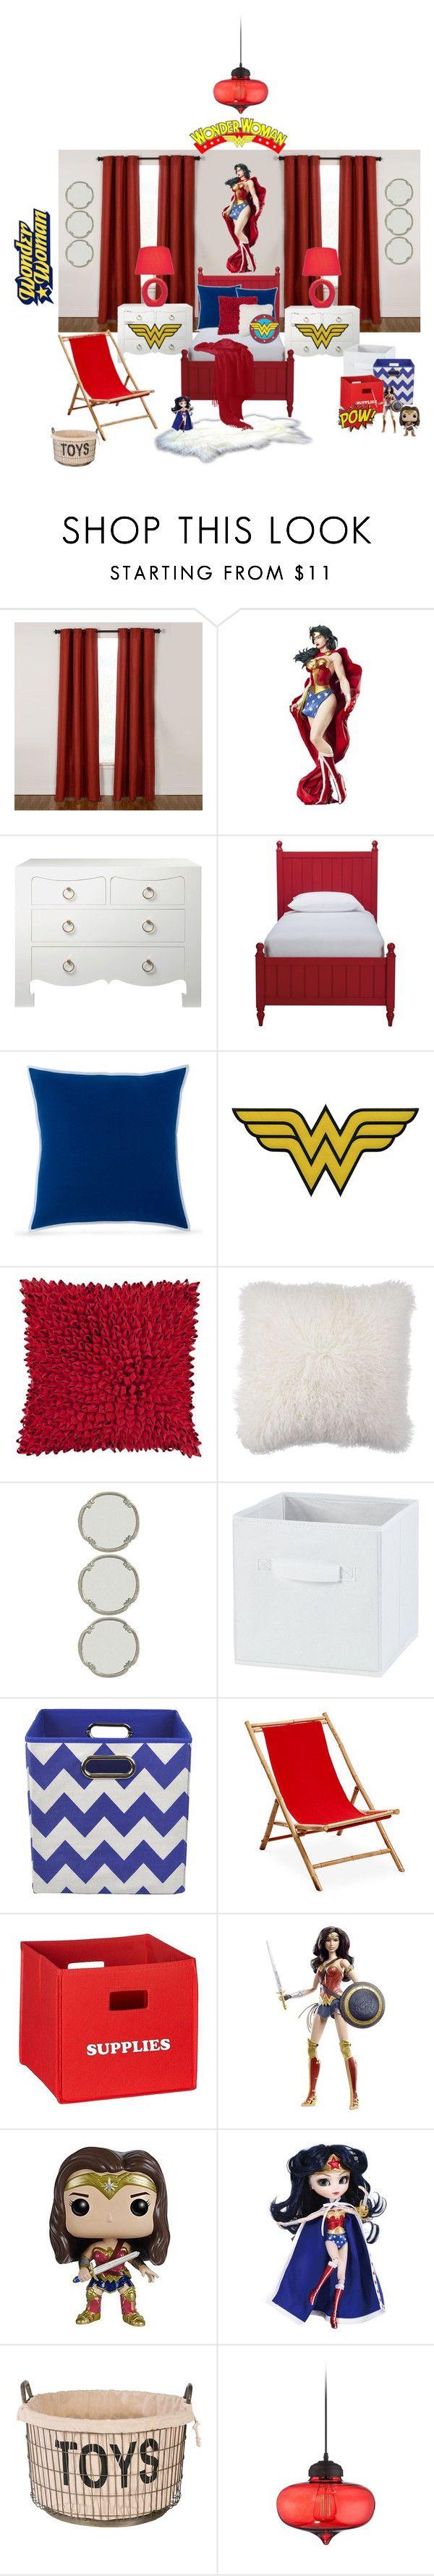 1000 ideas about superman bedroom on pinterest boys superhero bedroom superman room and - Superman interior designs ...